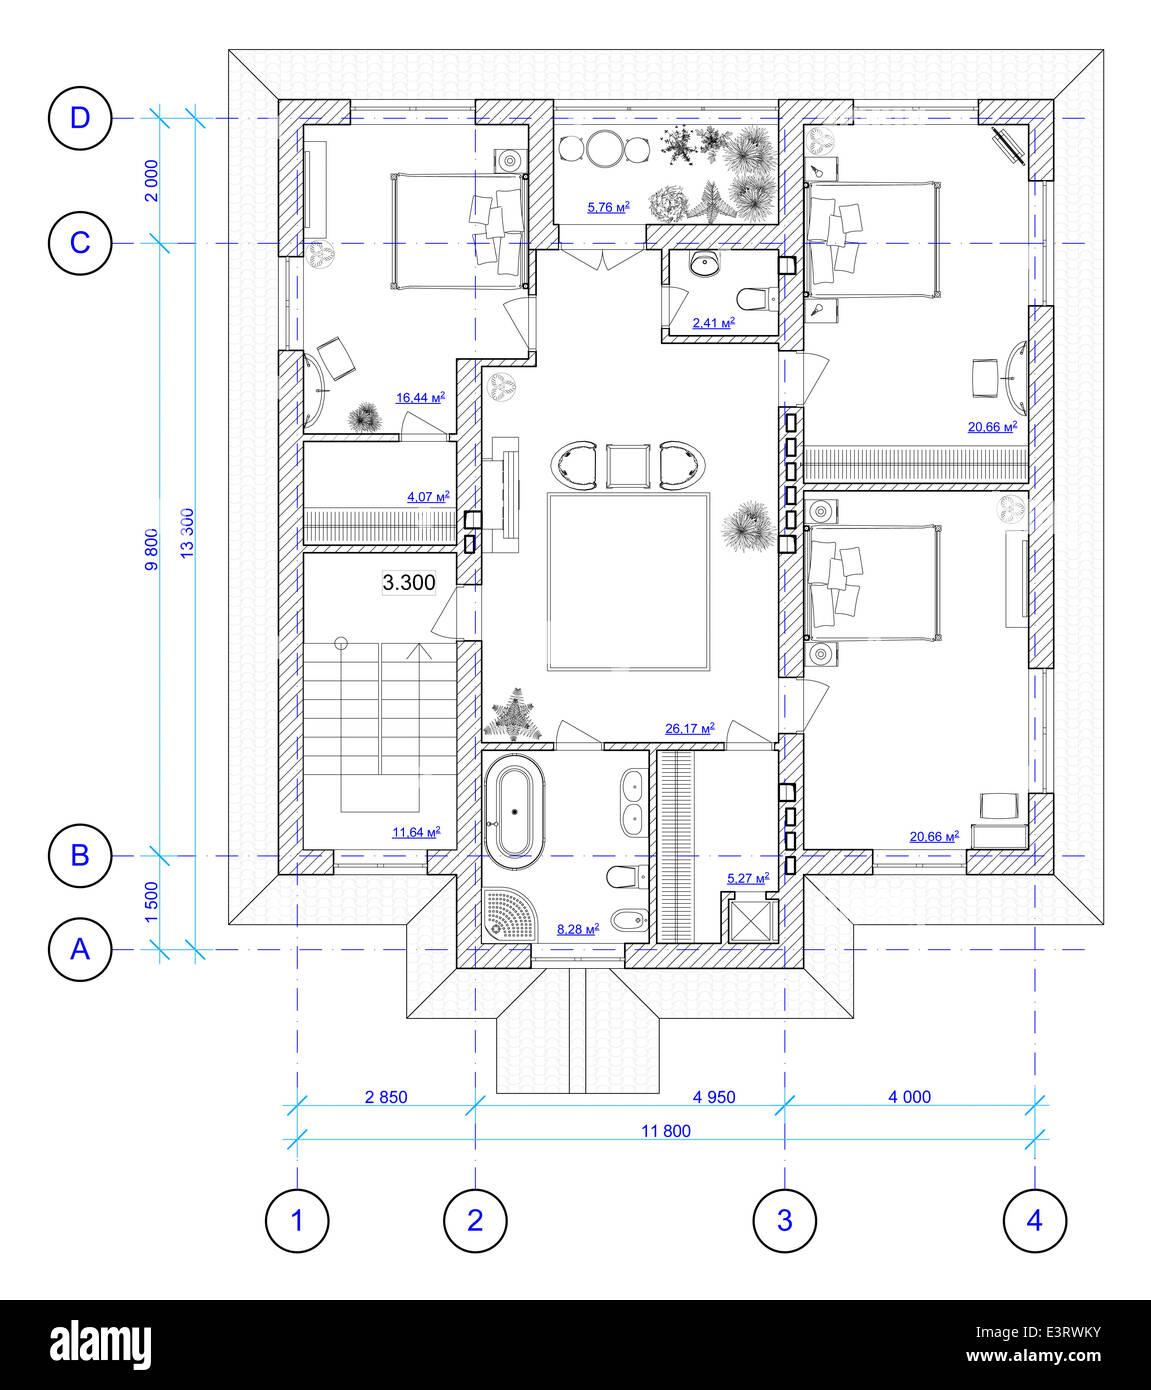 Build house draw blueprint imgenes de stock build house draw esquema arquitectnico del segundo piso de la casa imagen de stock malvernweather Image collections